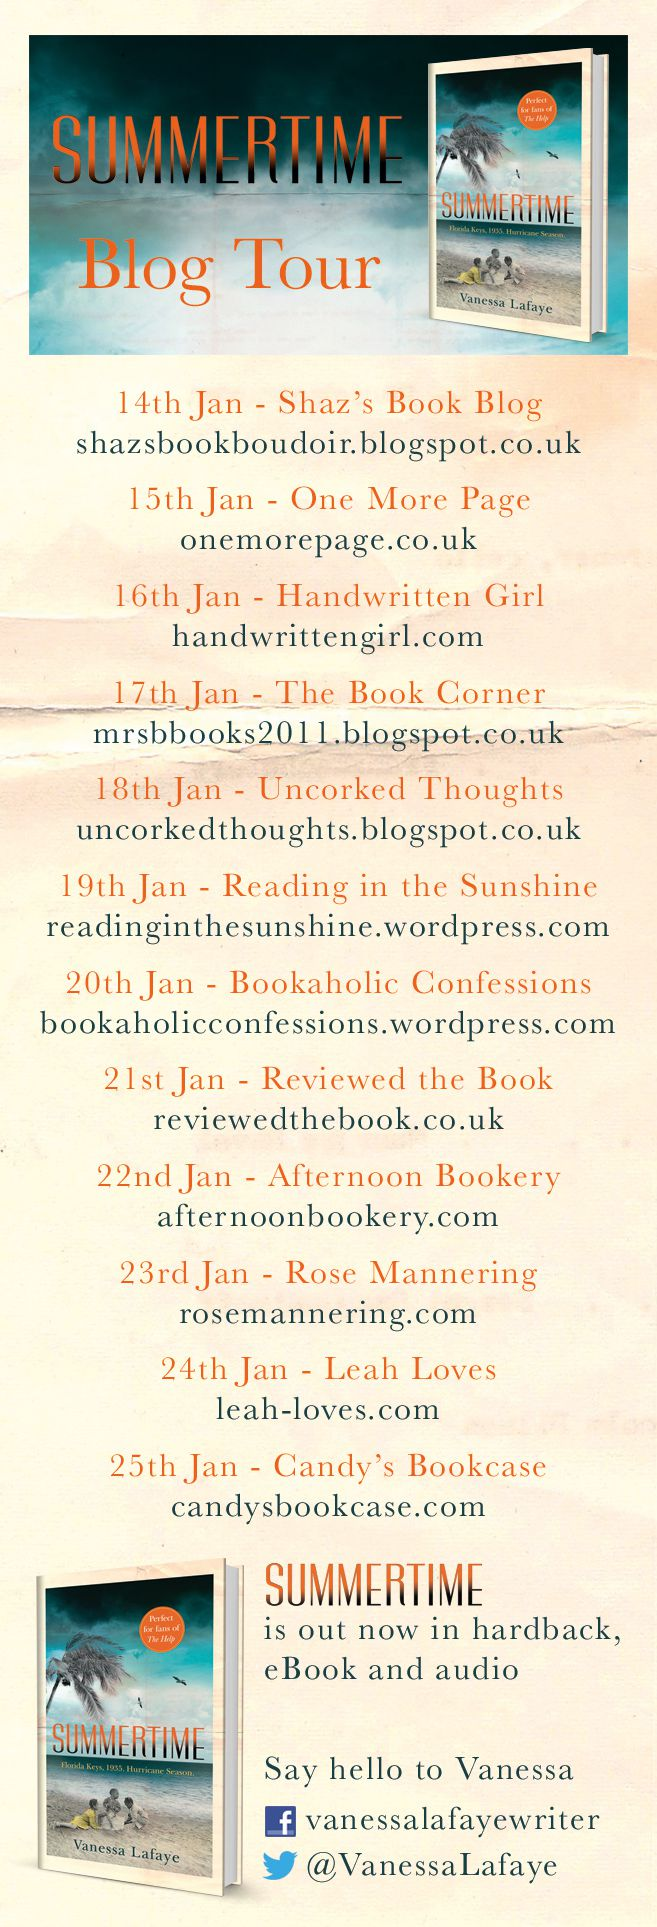 'Summertime Book Tour